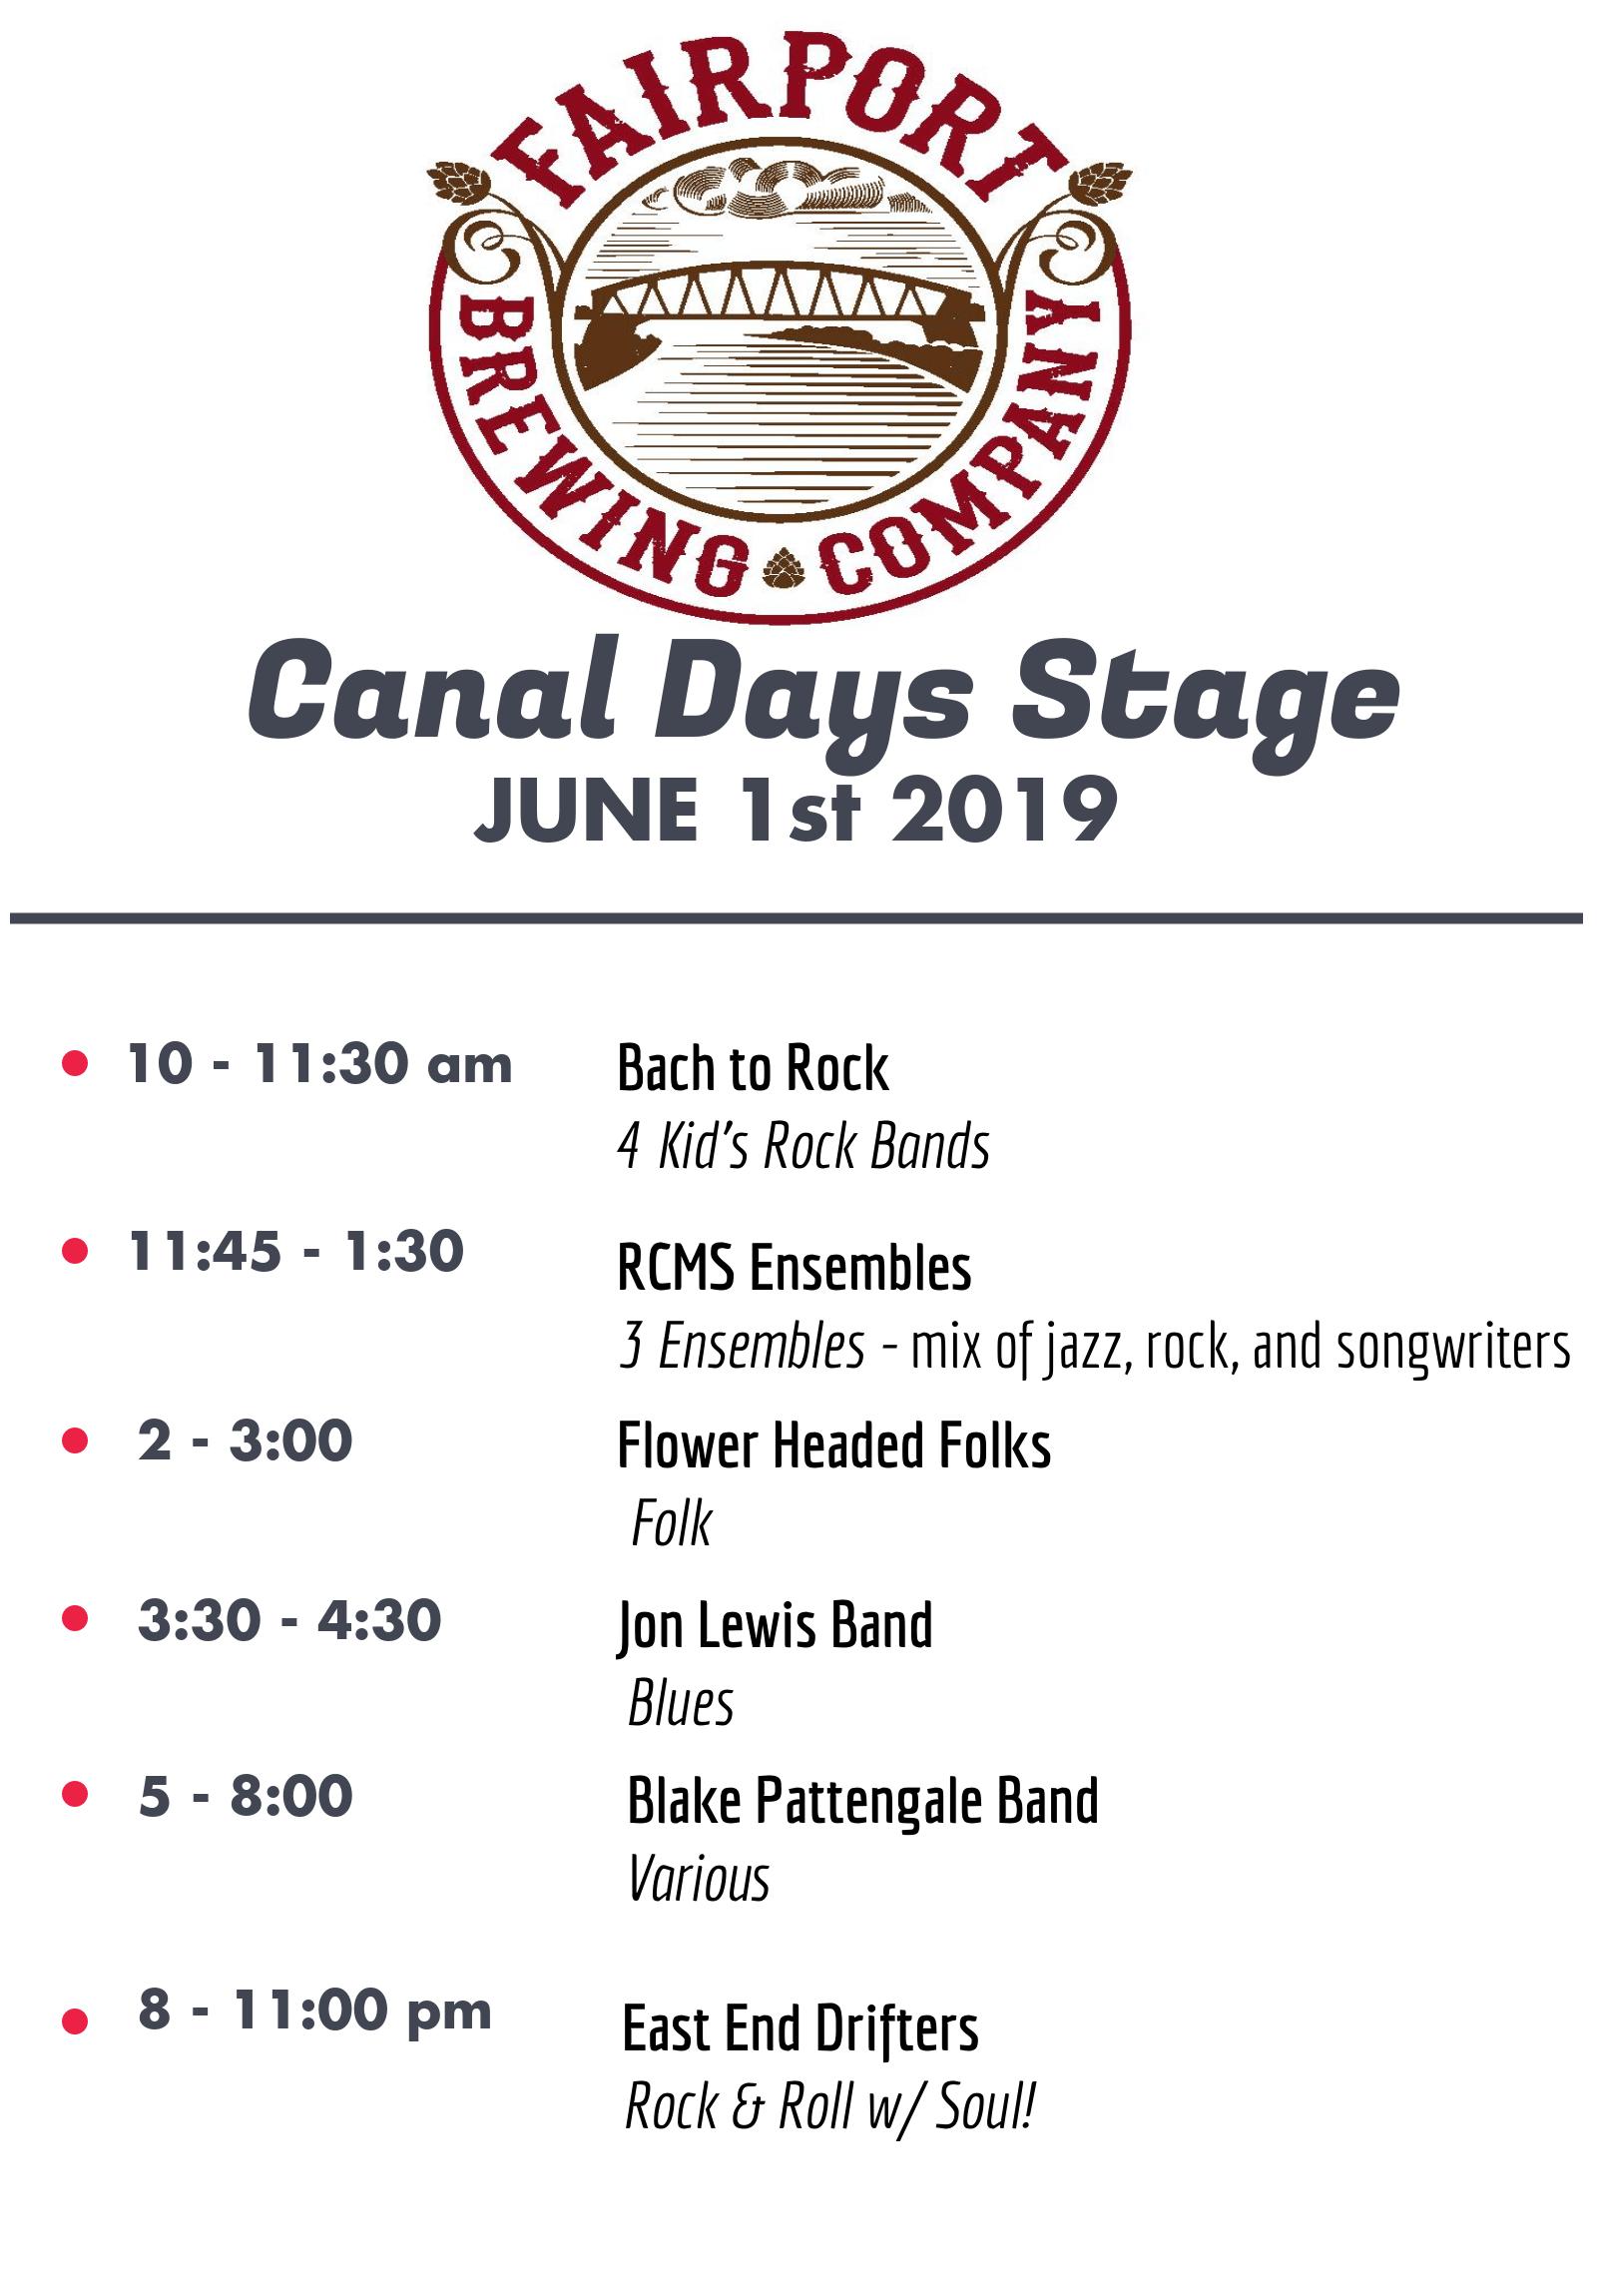 FBC's Canal Days Stage - Saturday!